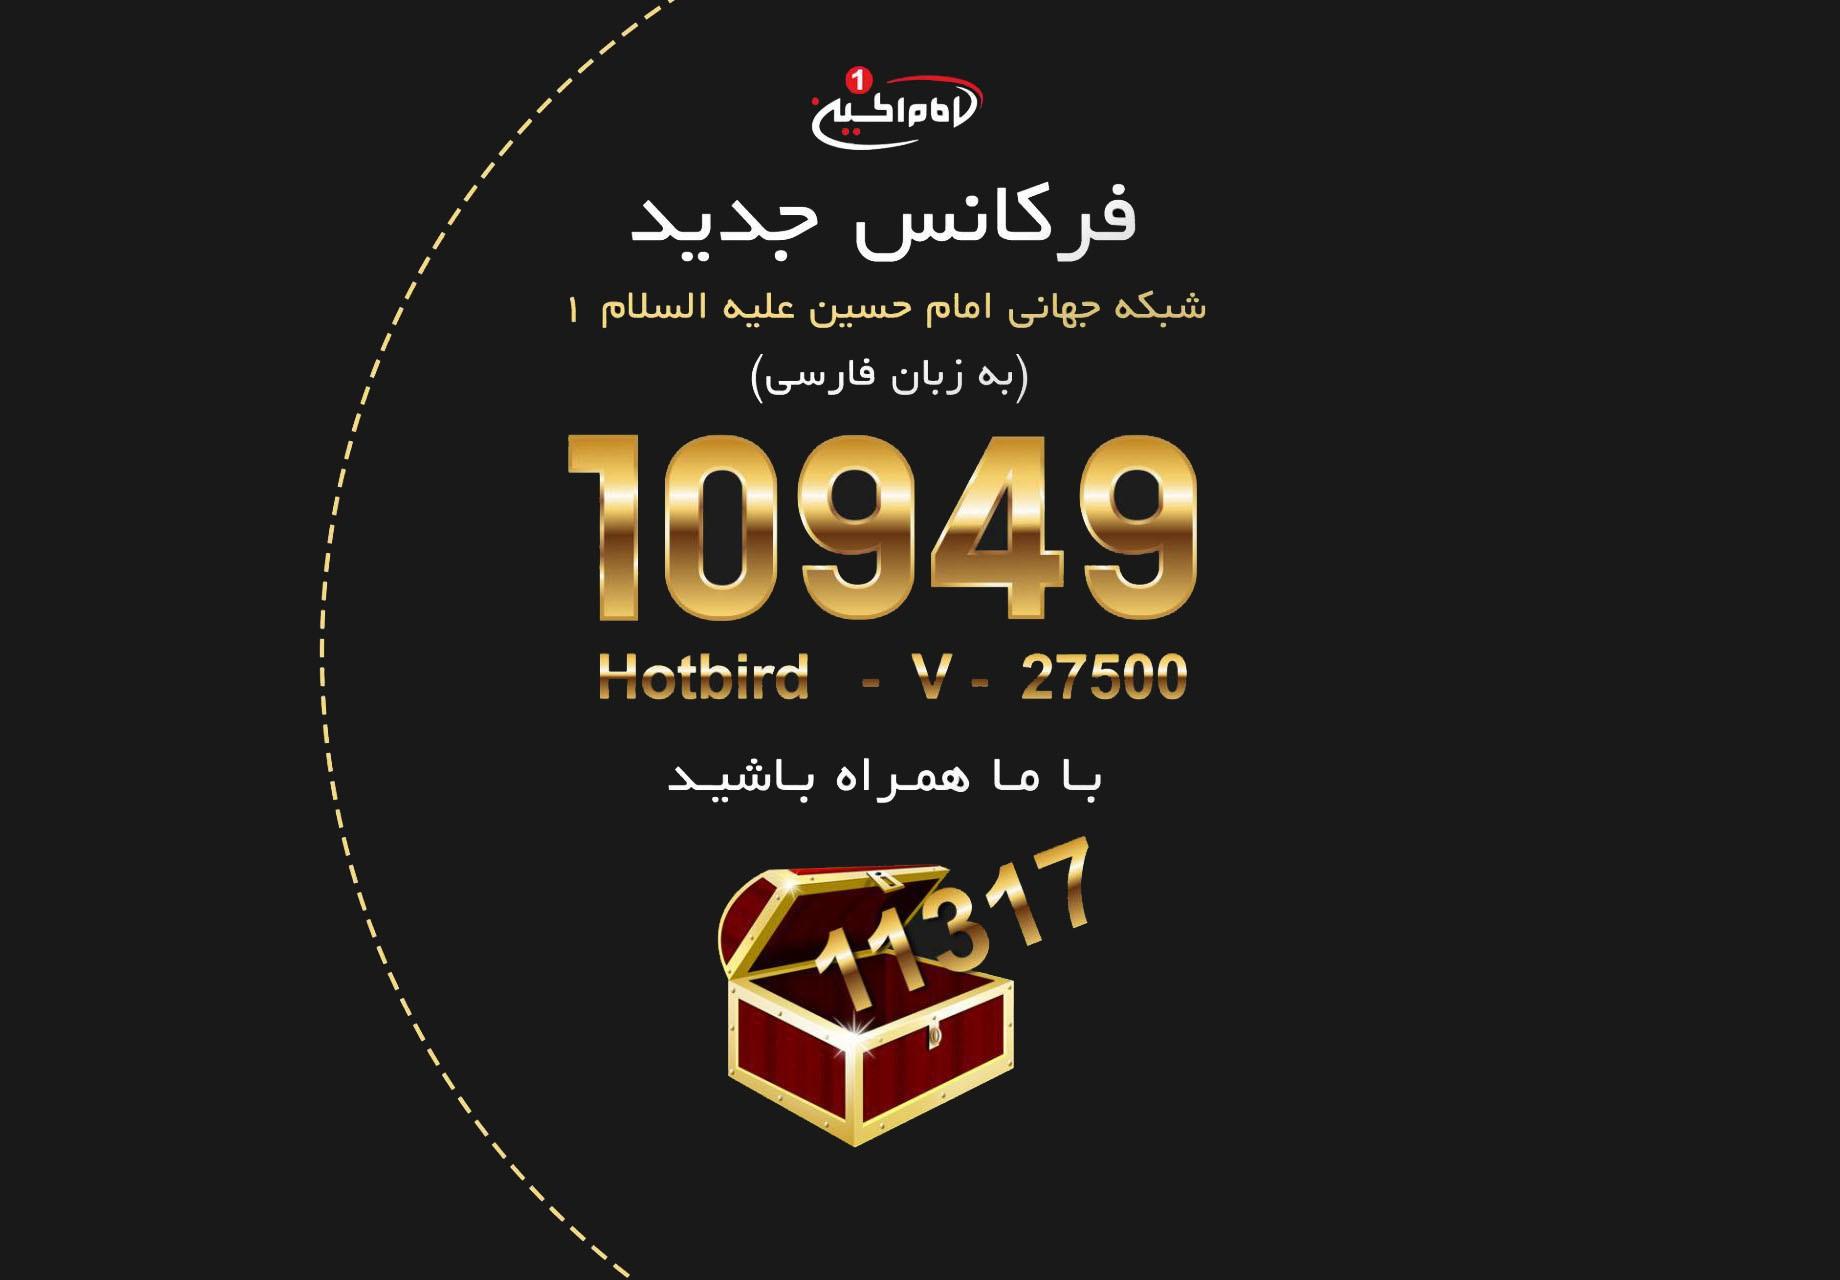 تصویر تغيير فركانس پخش شبكه جهانى امام حسين عليه السلام ١